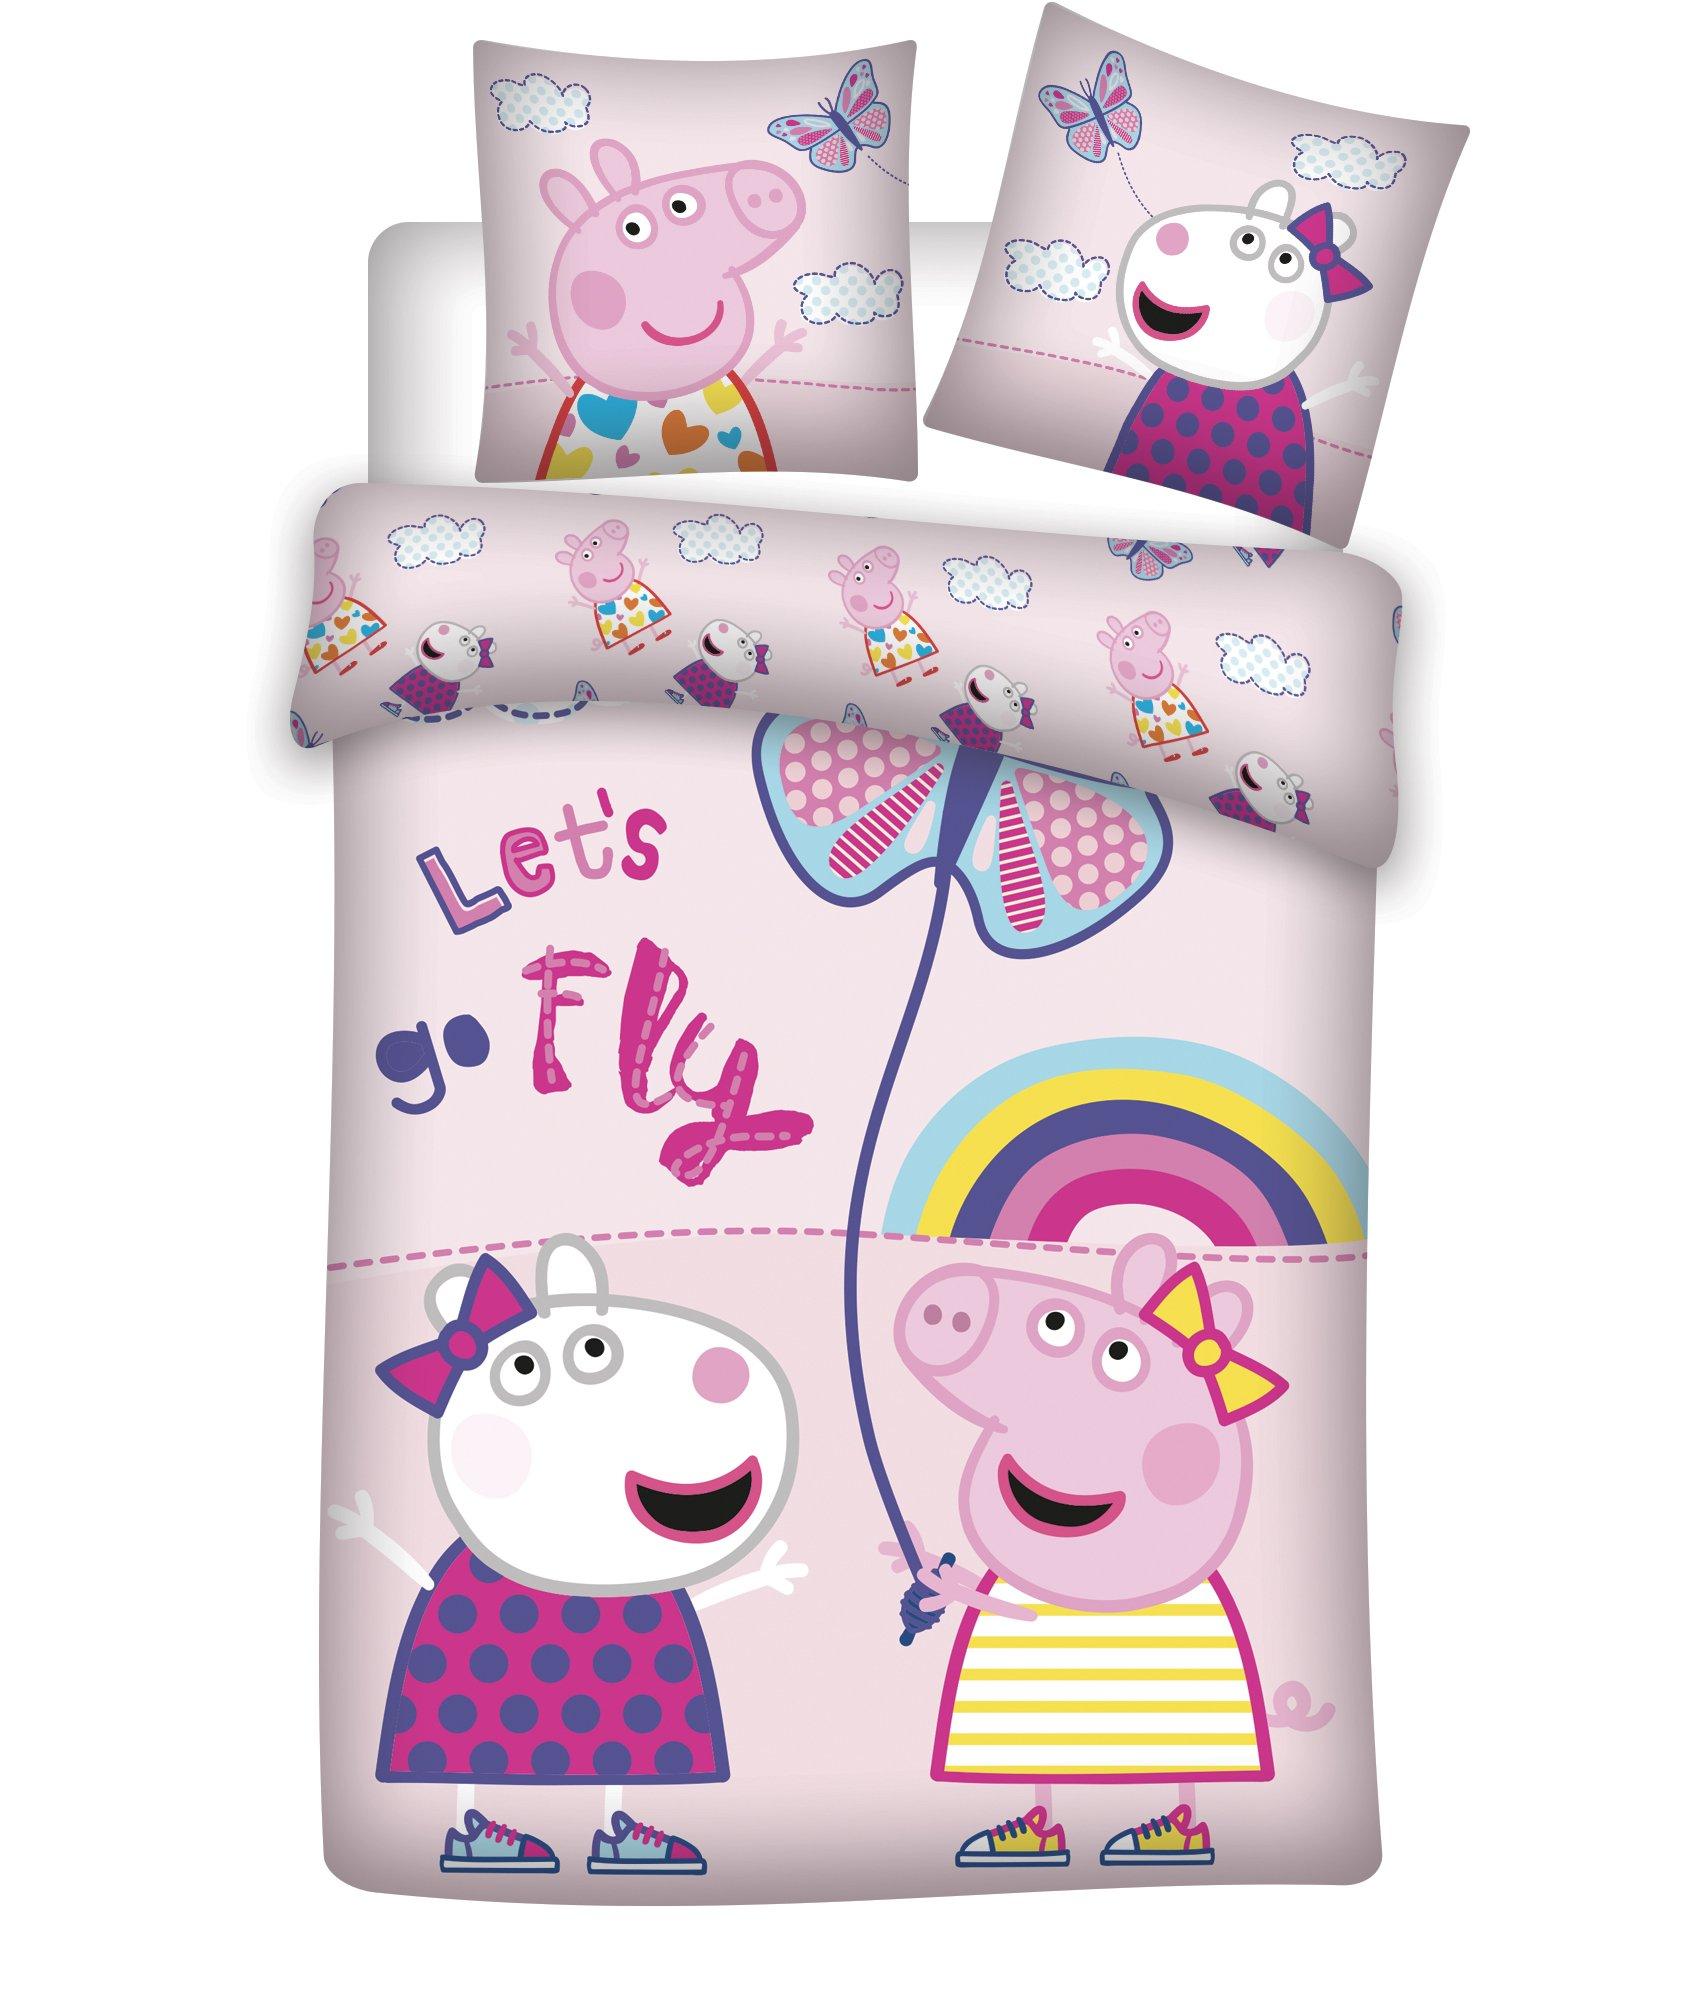 Bed Linen - Junior Size 100 x 140 cm - Peppa Pig (1000405)